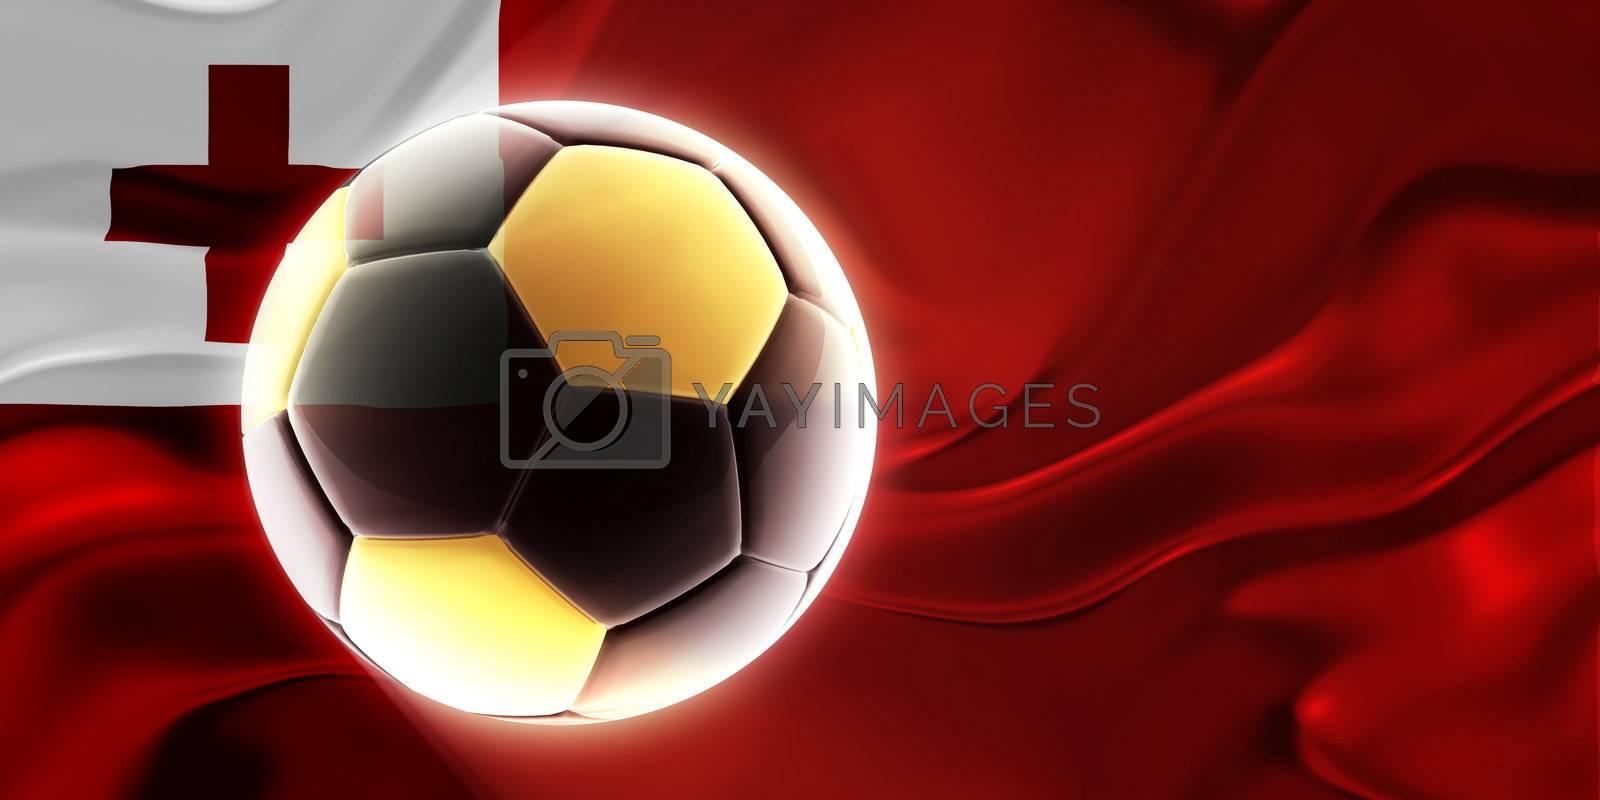 Flag of Tonga, national country symbol illustration wavy fabric sports soccer football